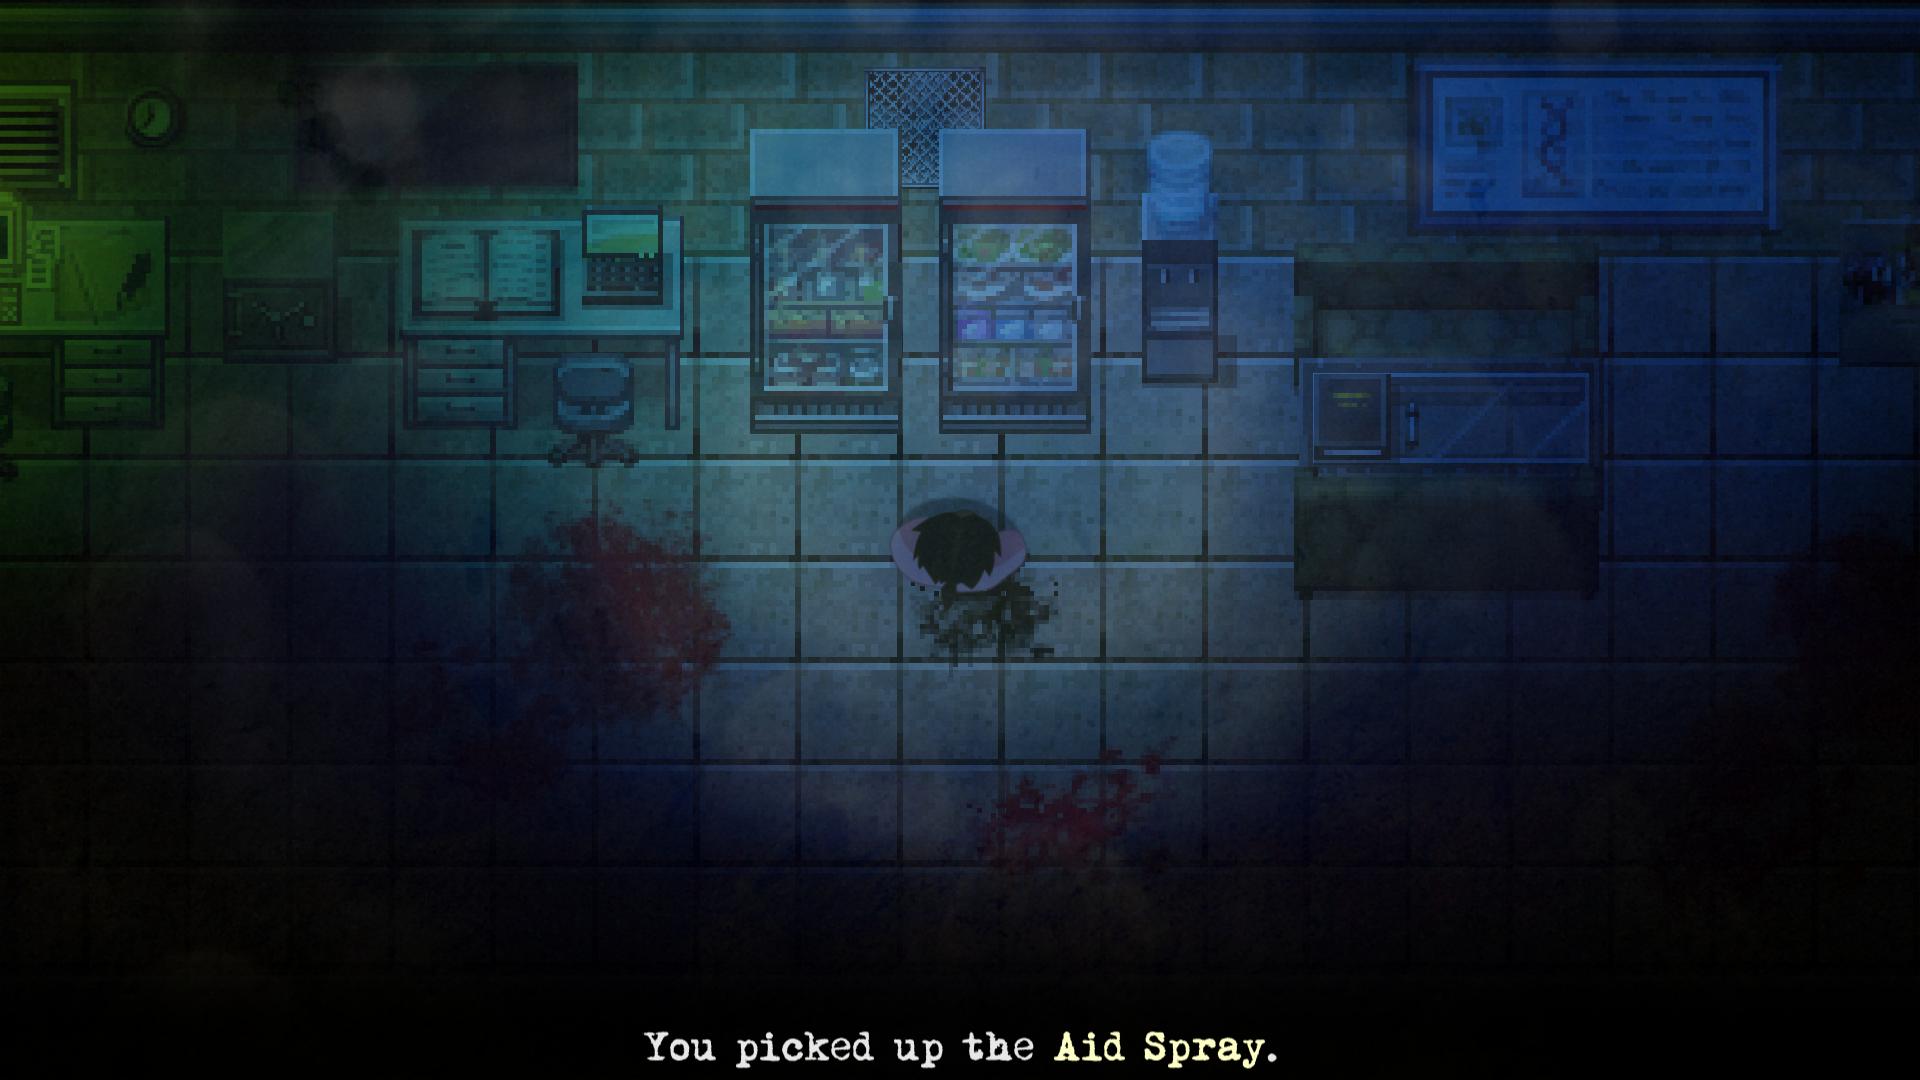 Dead Drop Studios' Newest Game Outbreak Releases Soon